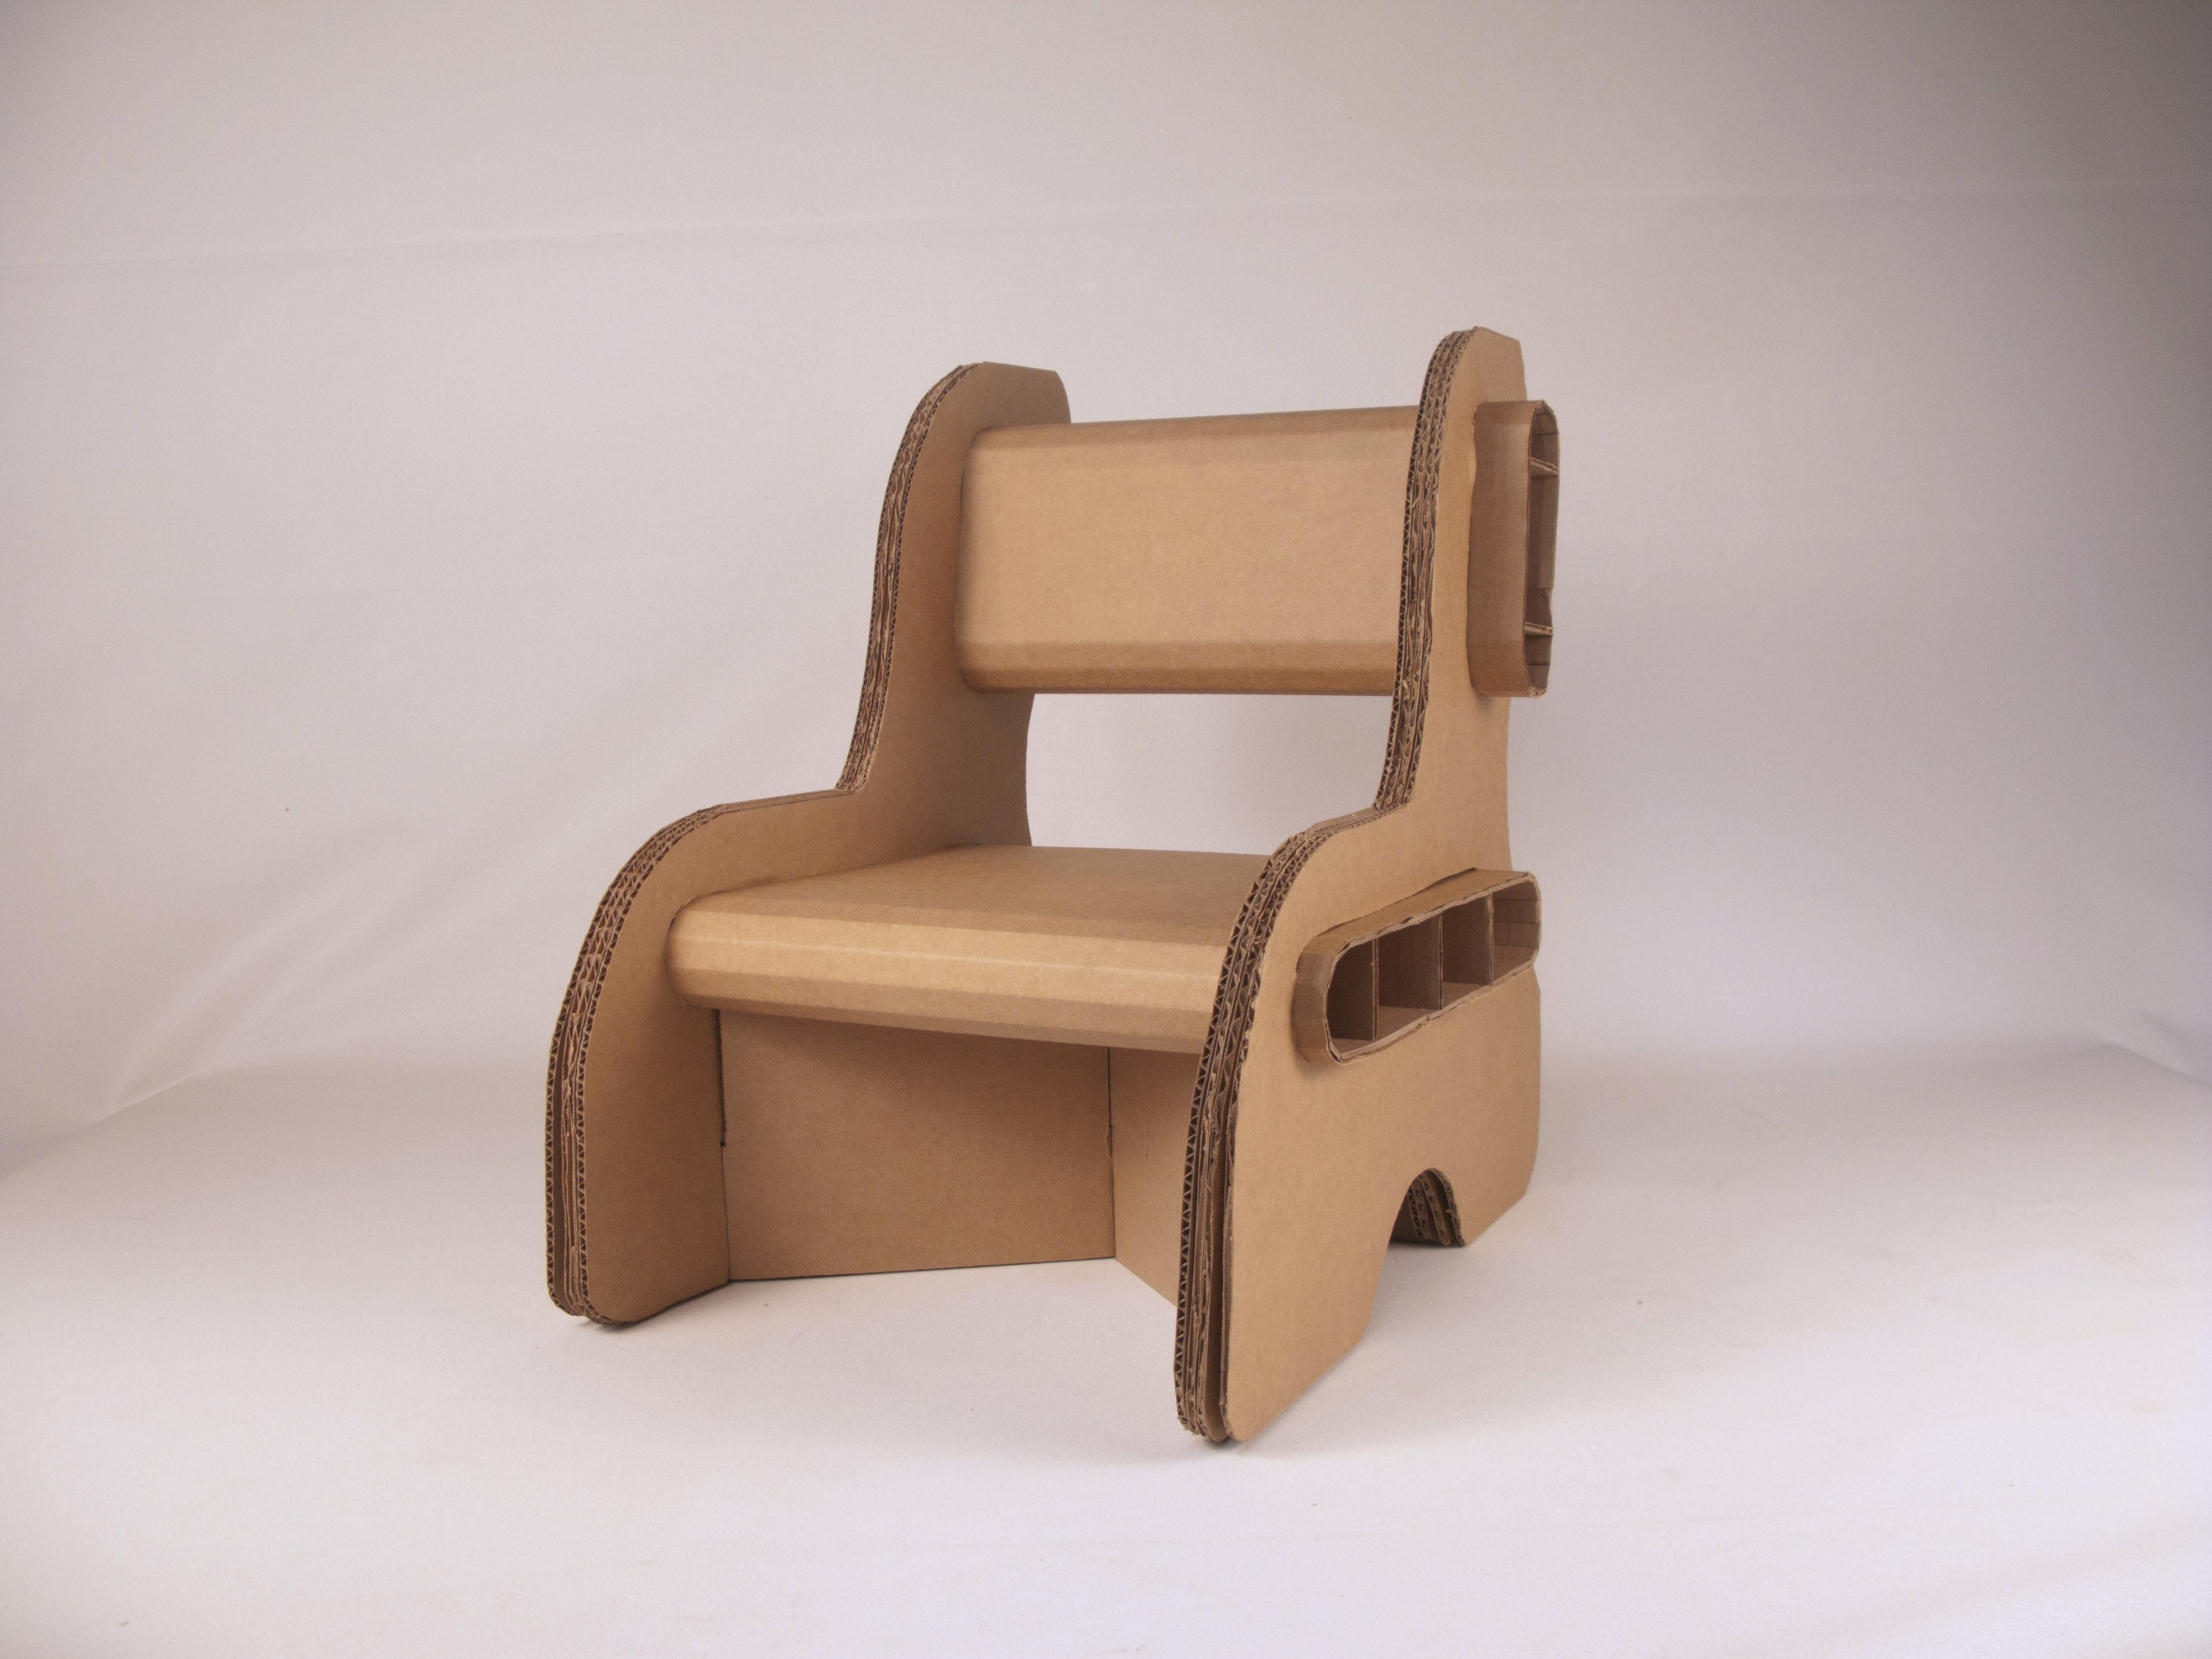 Cardboard chair template google search